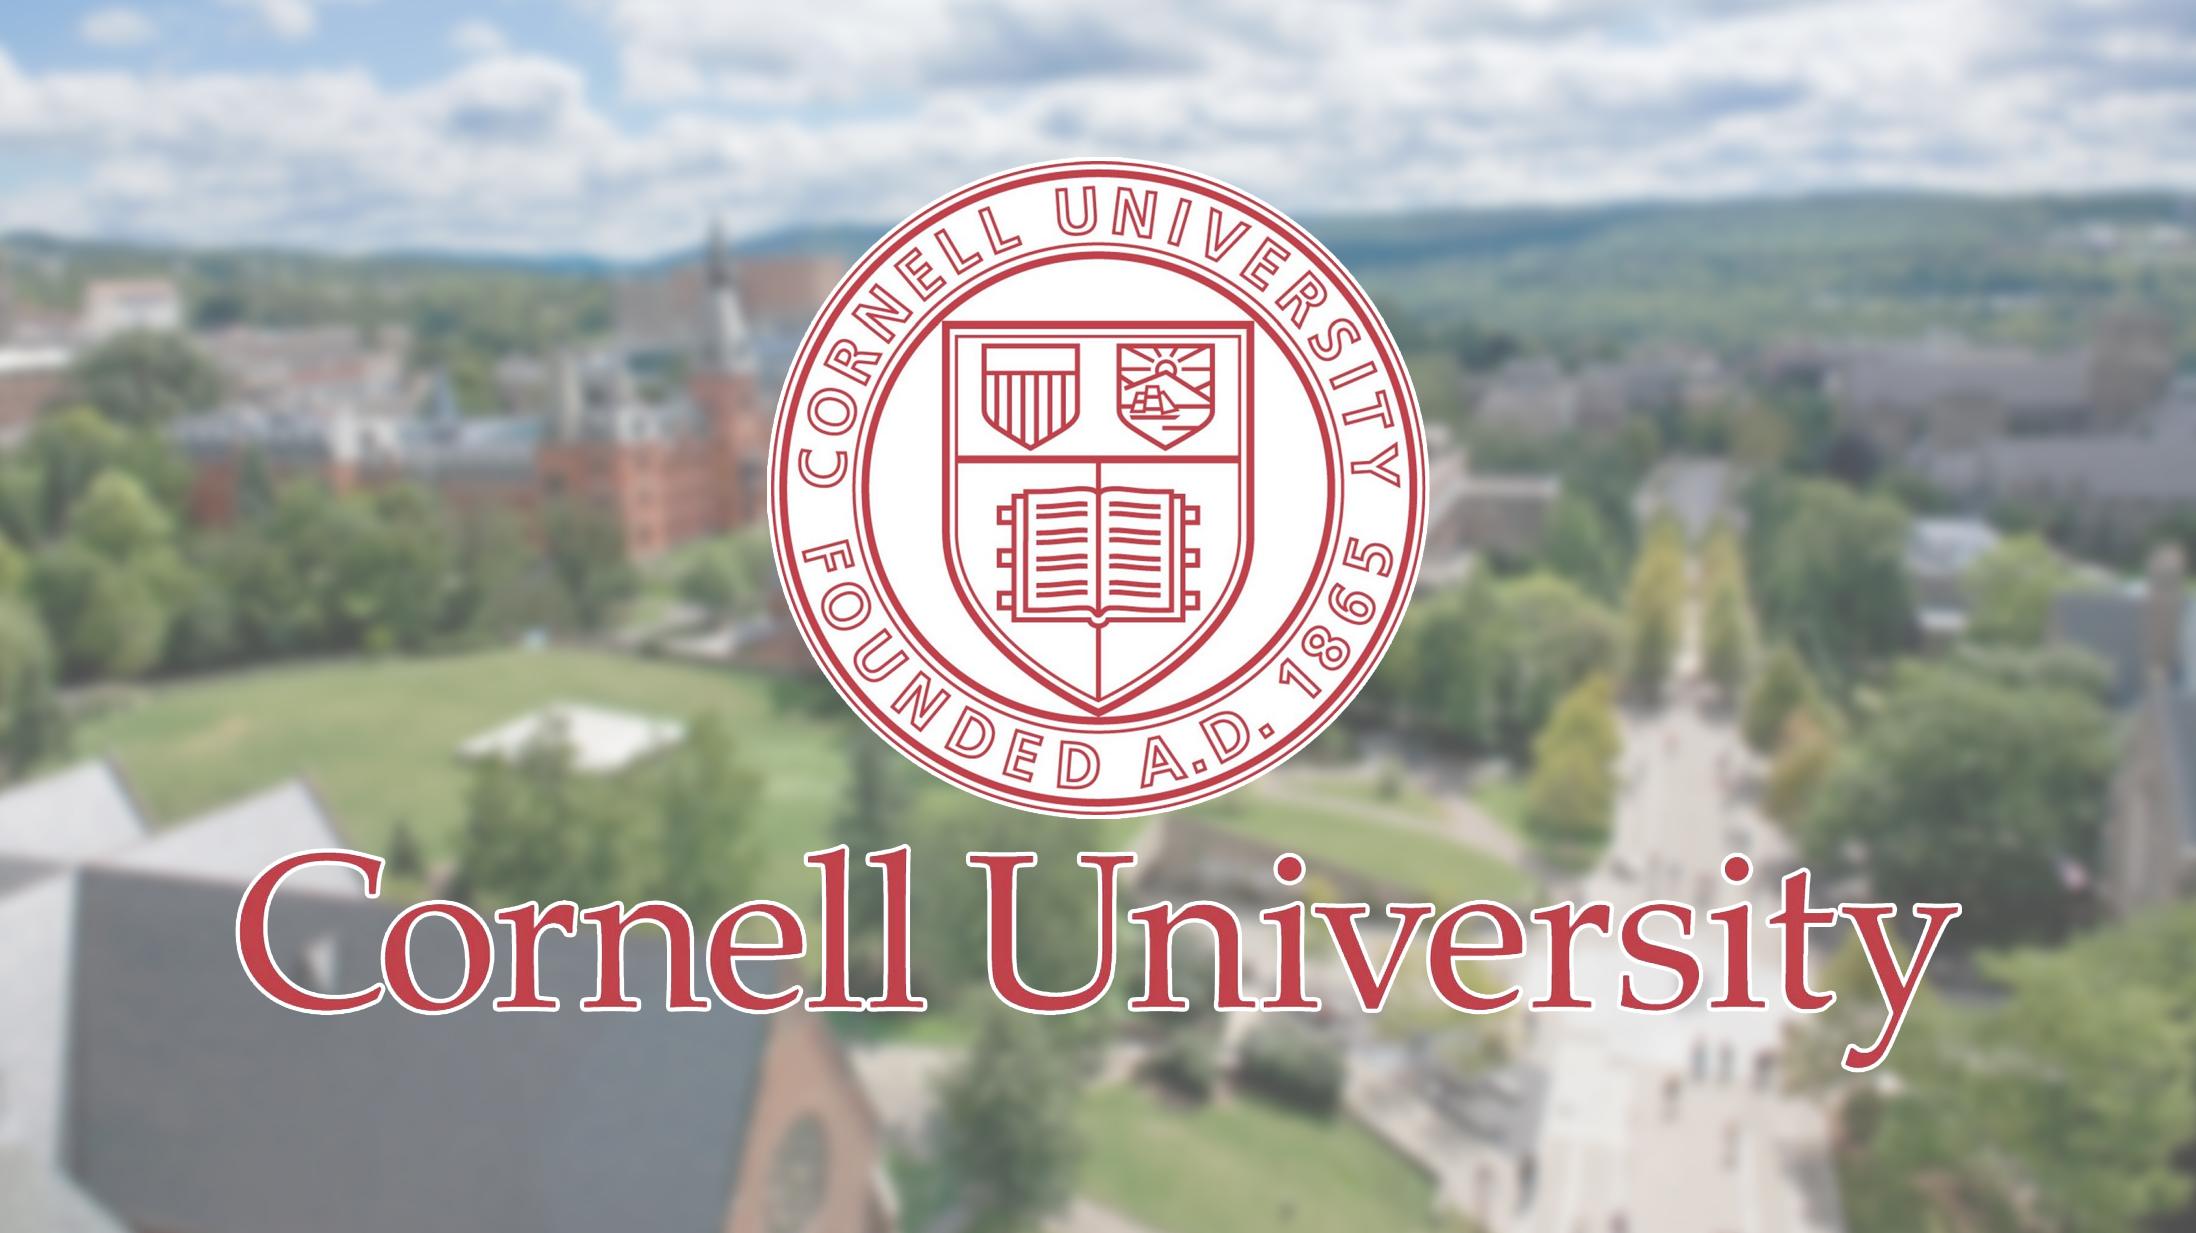 Cornell University WEB_1472730072662.jpg